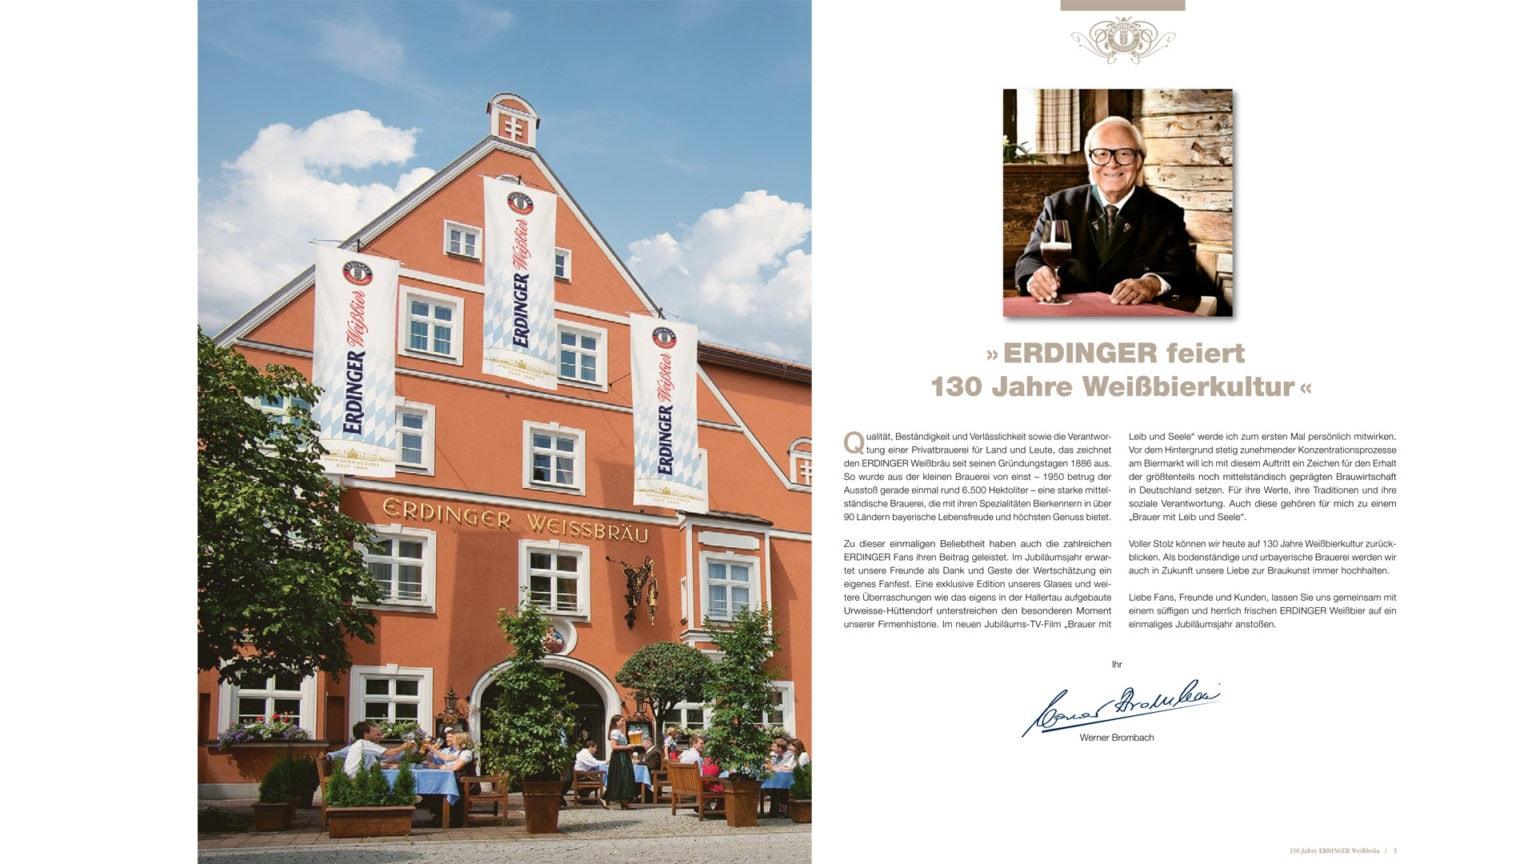 kiecom_ERDINGER Fanpost_Grußwort Werner Brombach 130 Jahre ERDINGER Weißbräu